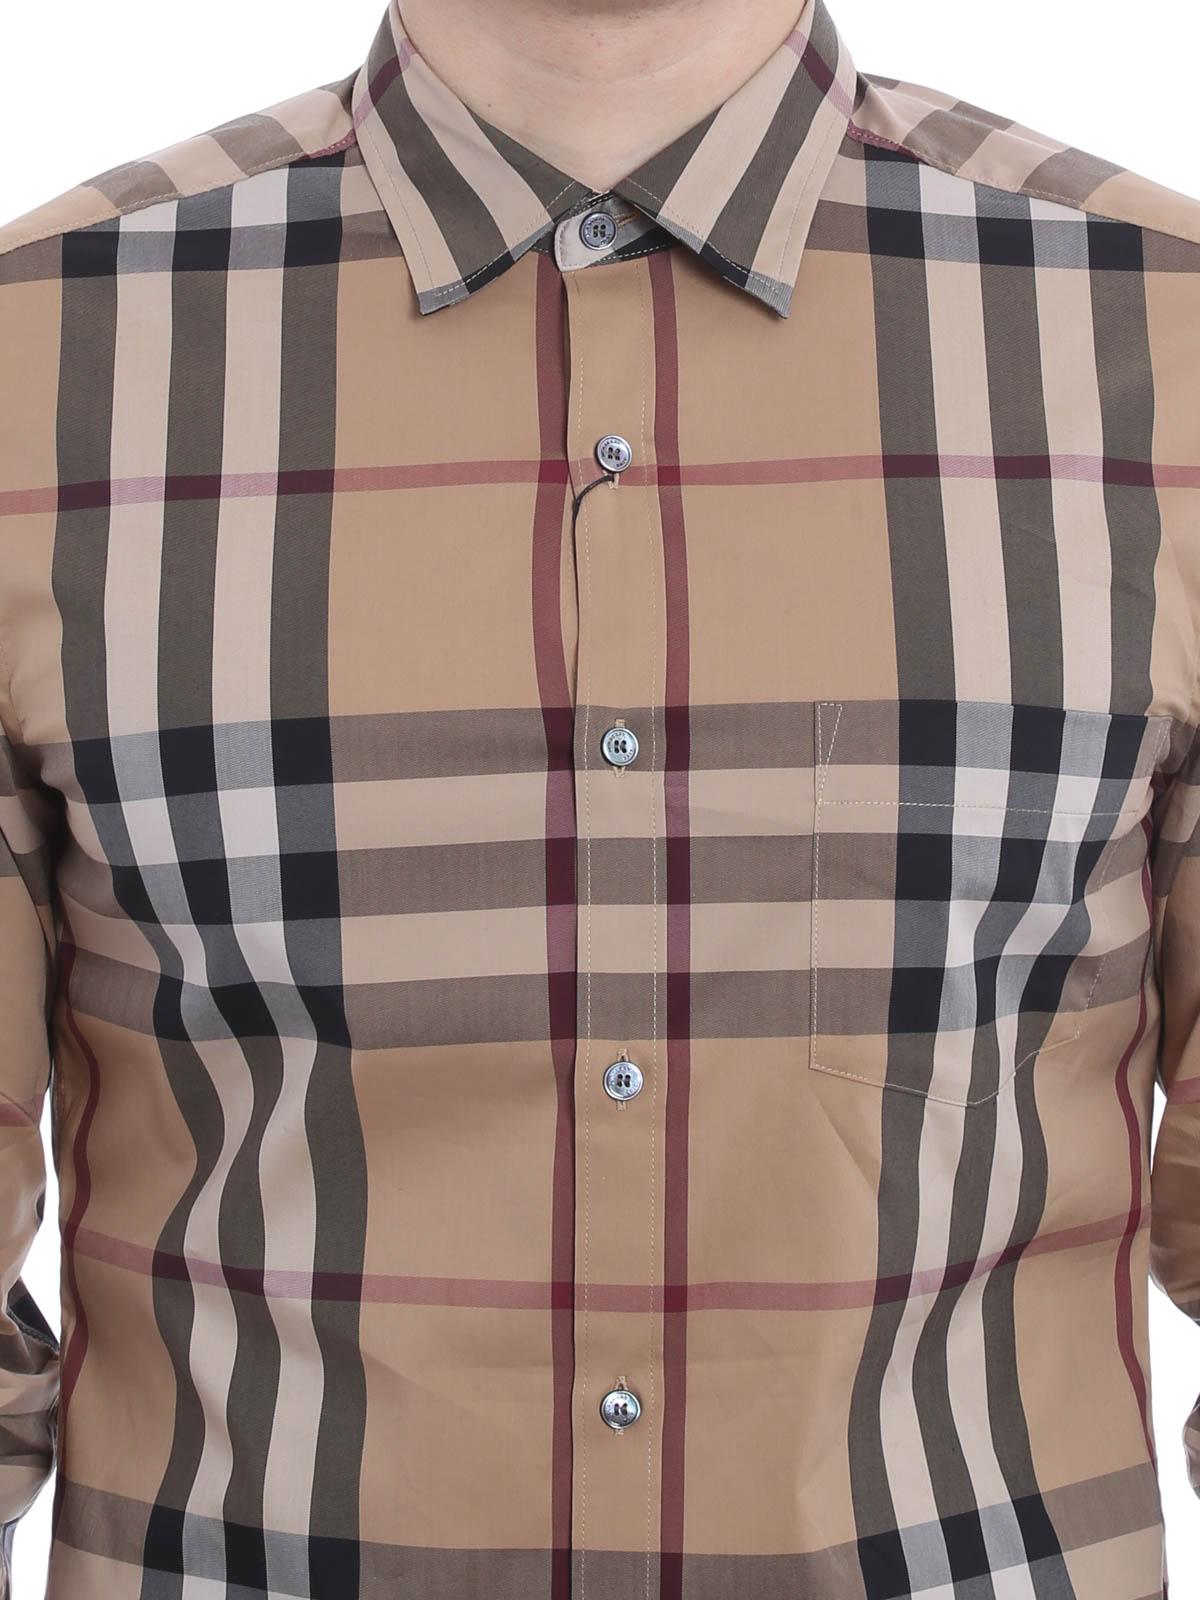 buy burberry shirts online